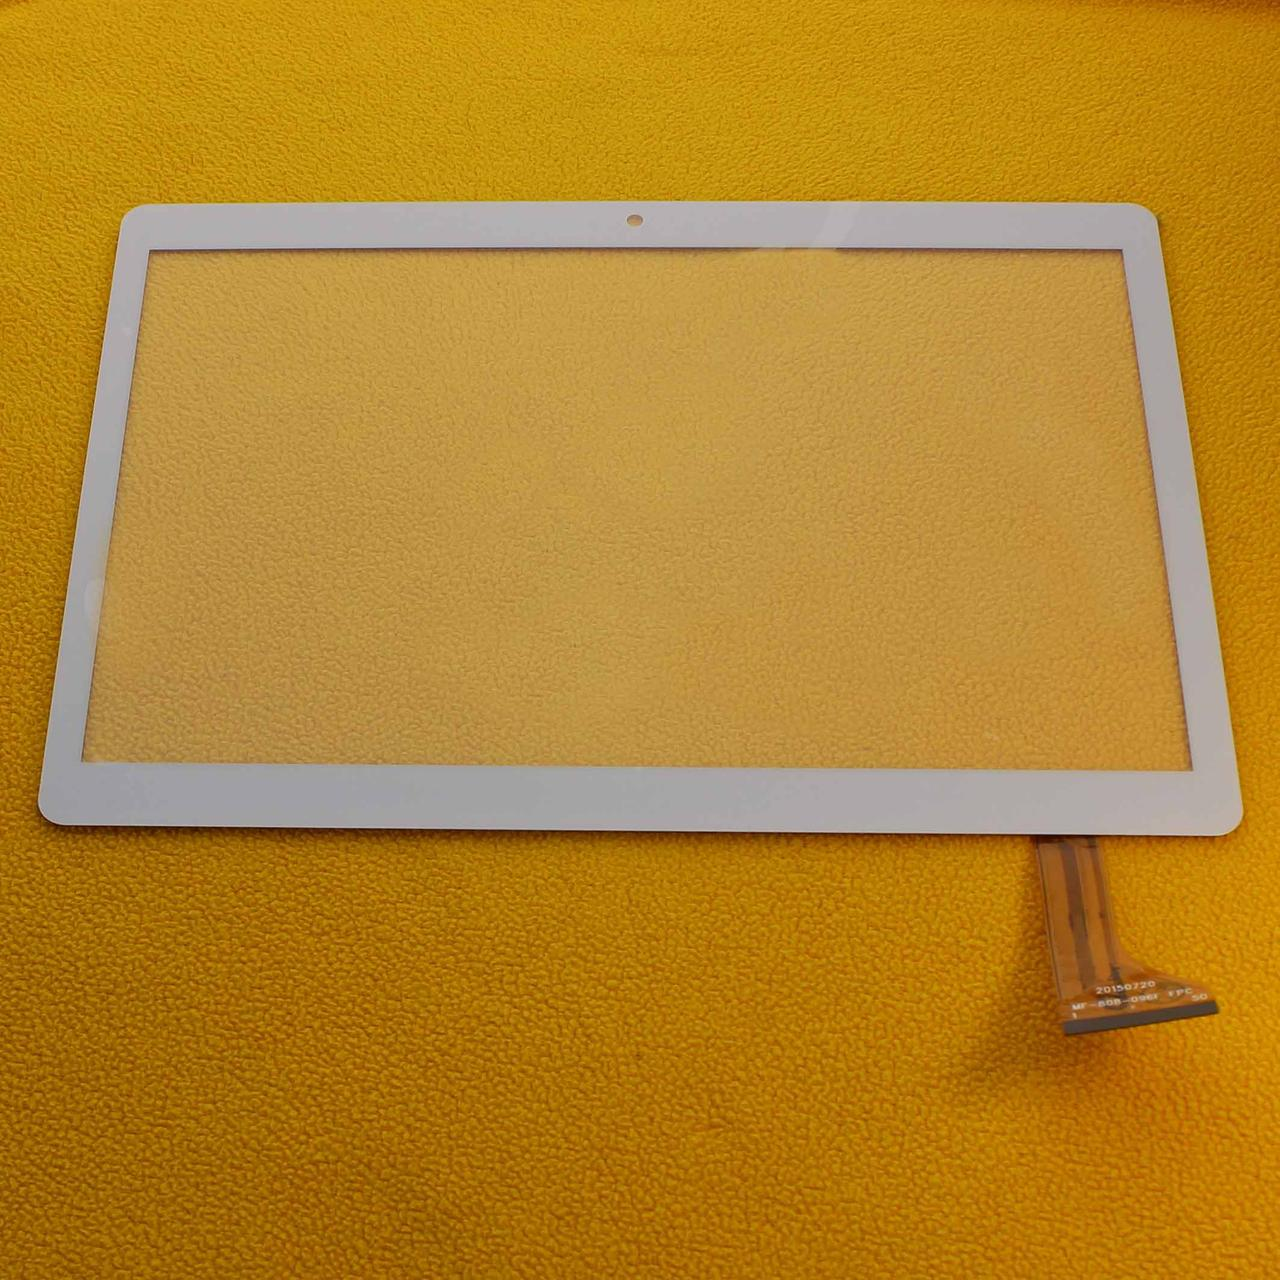 Тачскрин, сенсор DH-1069A1-PG-FPC228 белый для планшета